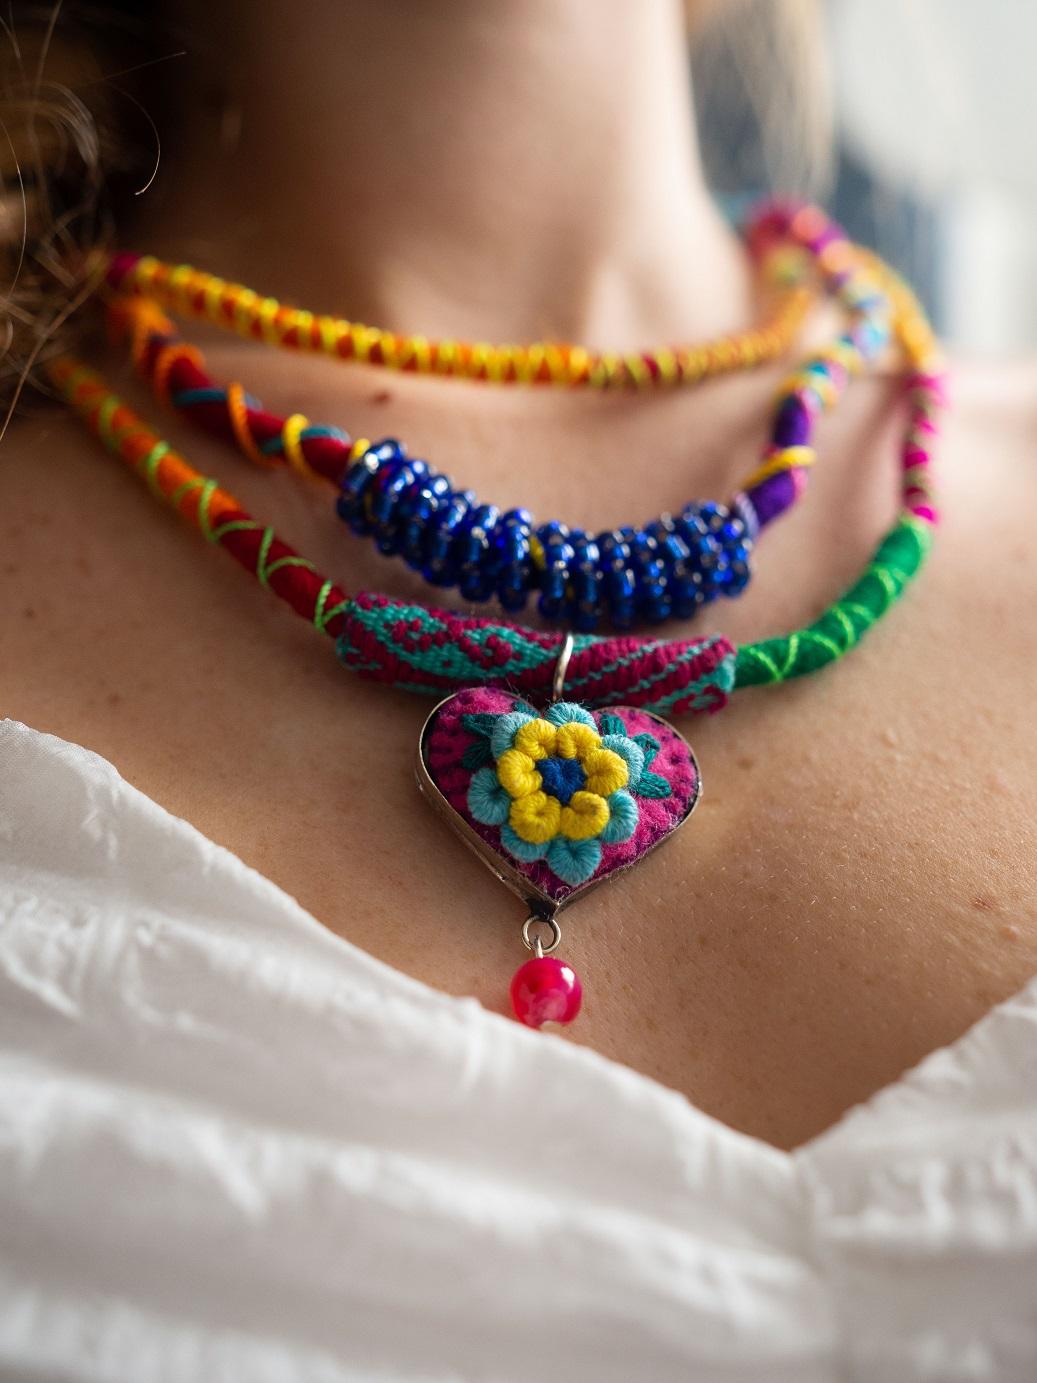 Boho Poncho, Boho Mode, Schal, Poncho mit Stickerei, Huipil, Mexikanische Mode, Mexikanische Kleider, Guatemala, bunte Frühlingsmode, Frühlingsjacke, Frühlingsschal, Hippie, ethno, gypsy Mode, böhmische Mode, Frida Kahlo Mode